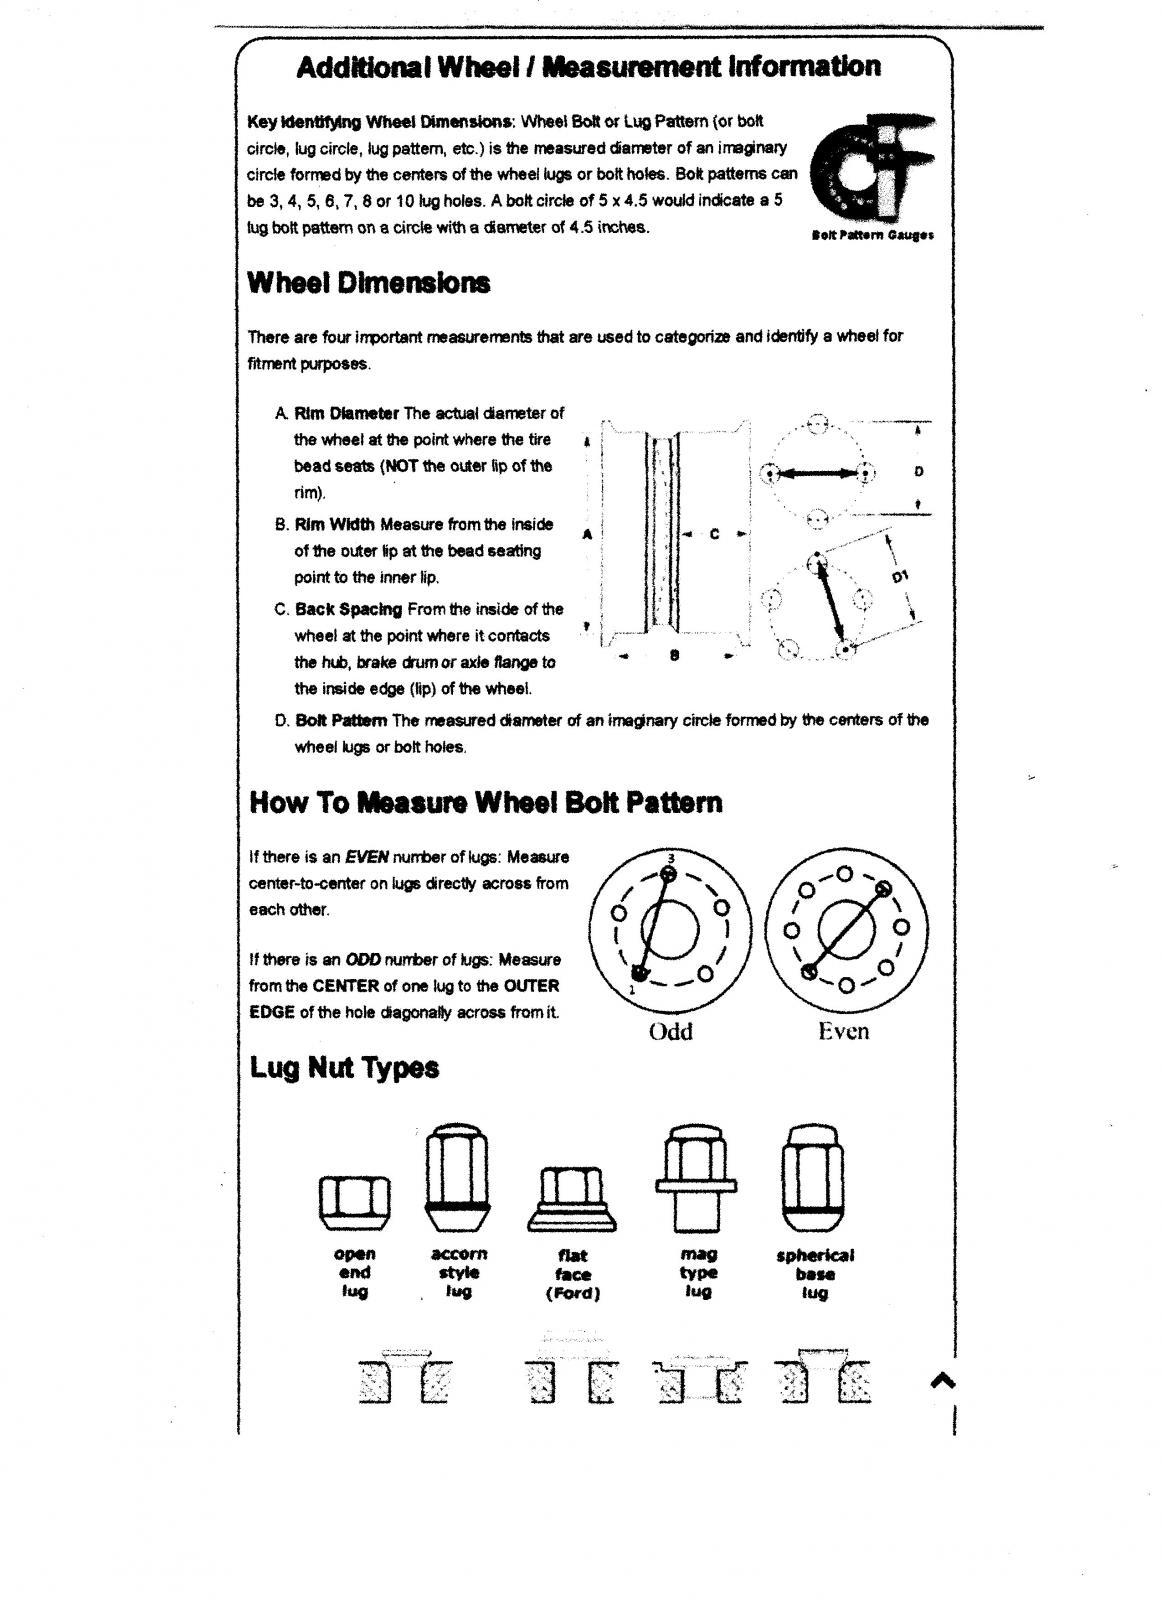 Key Id Wheel Dimensions